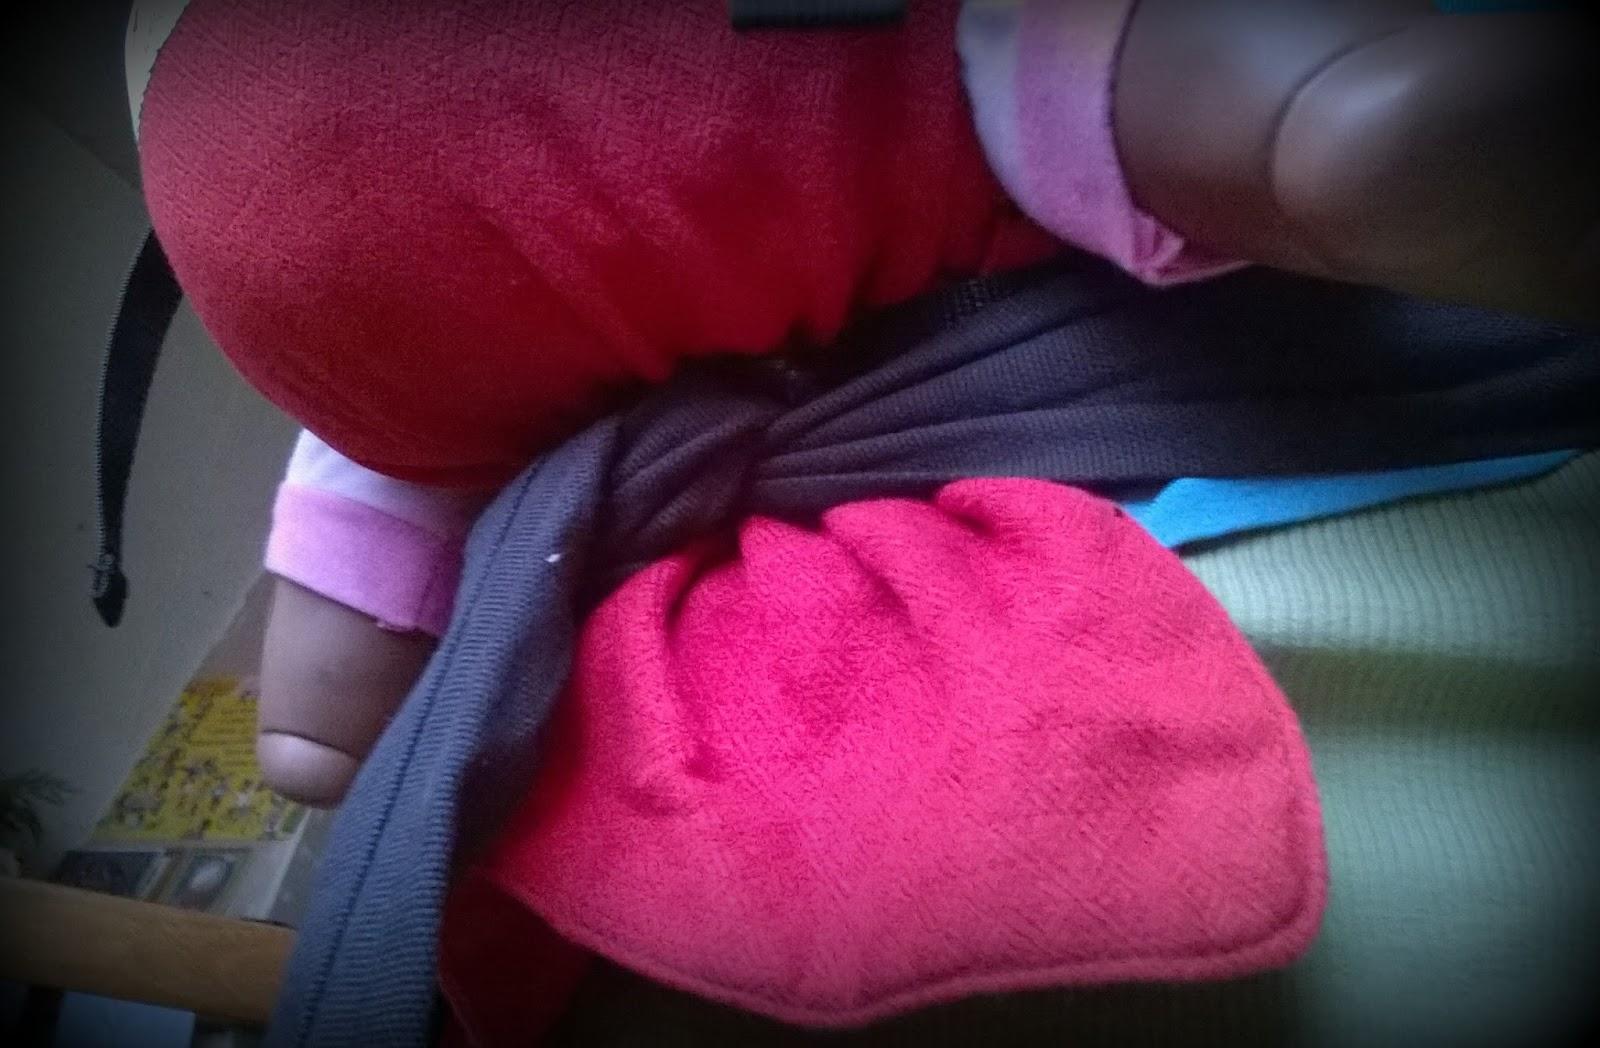 1c70cfcade1 test babycarrier storchenwiege meï-taï meitai babywearing portage avis  mesures bretelles hybride clip boucle sangle